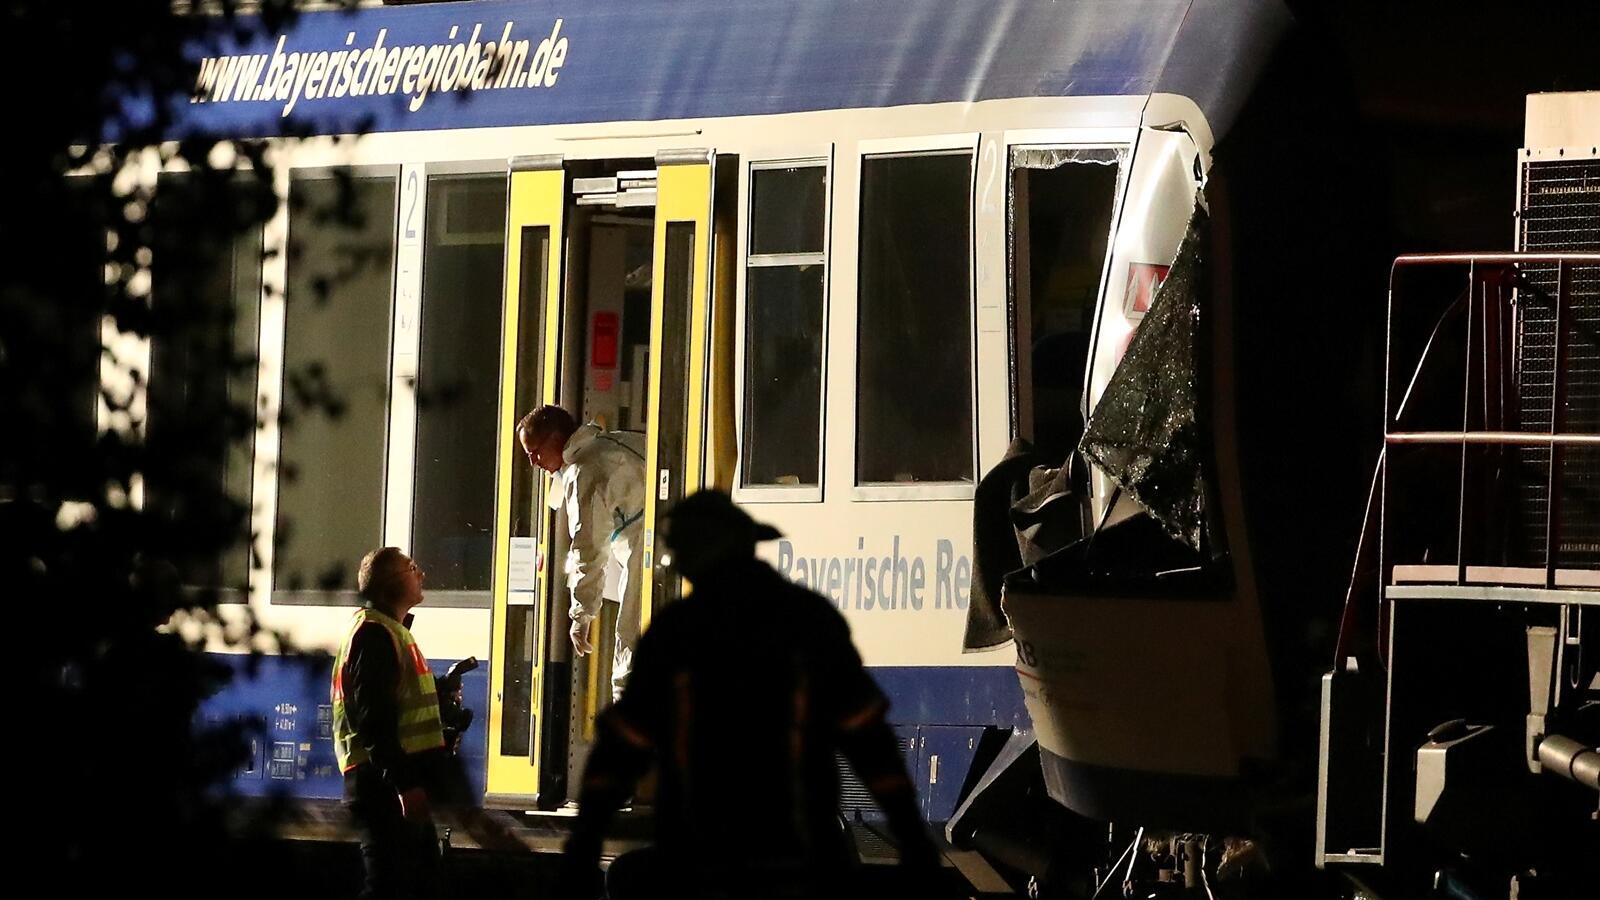 Tabrakan Kereta di Jerman Tewaskan Dua Orang